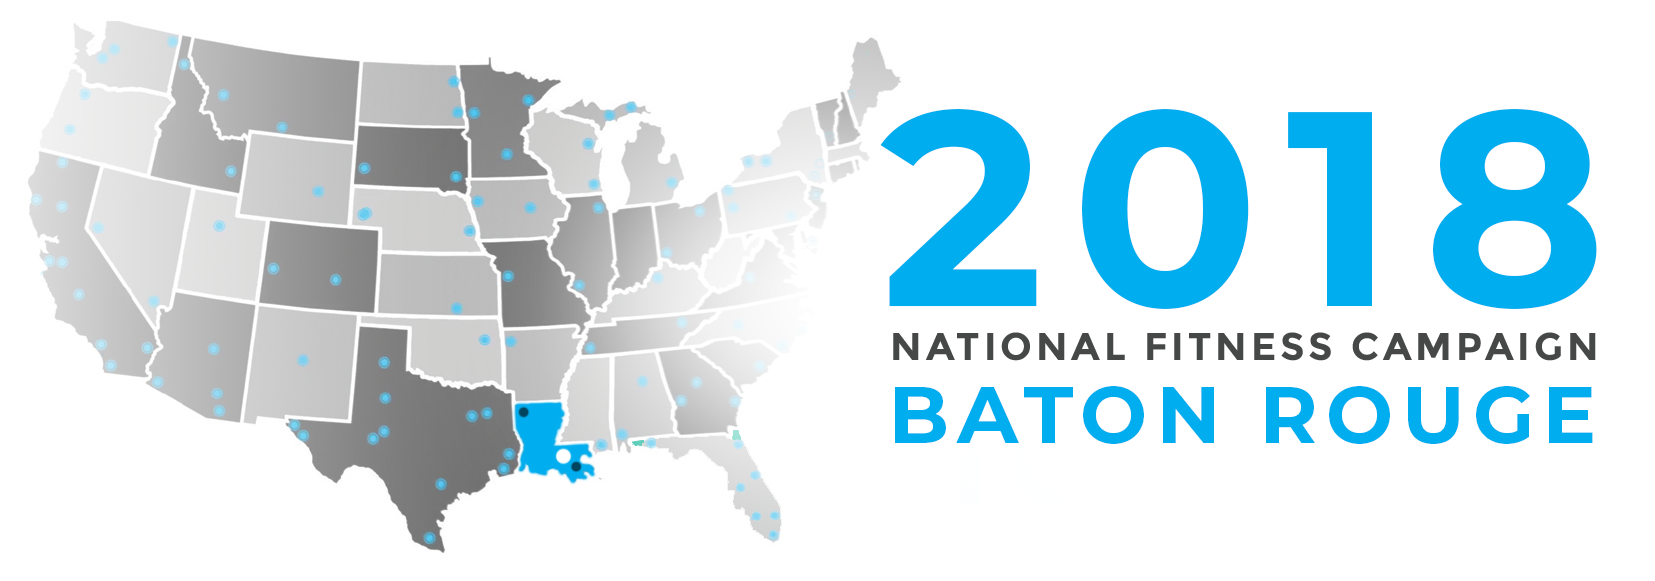 2018 Campaign Logo Baton Rouge.png